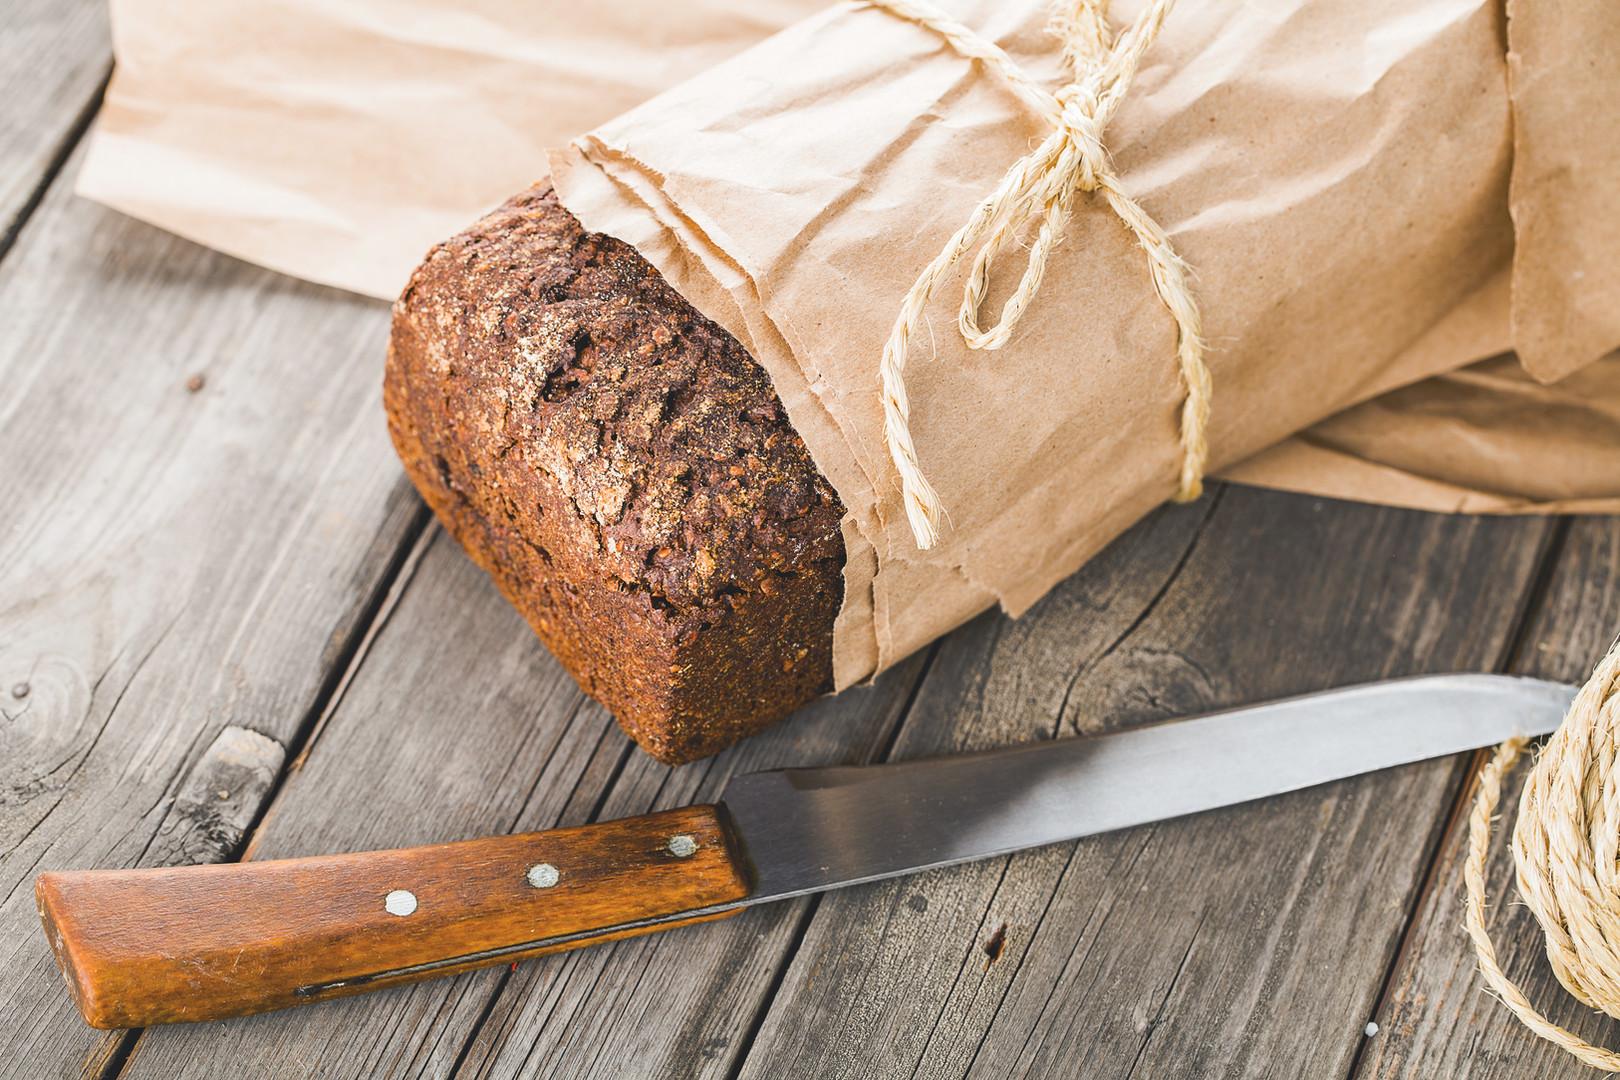 Traditionellt bröd Wapped i papper